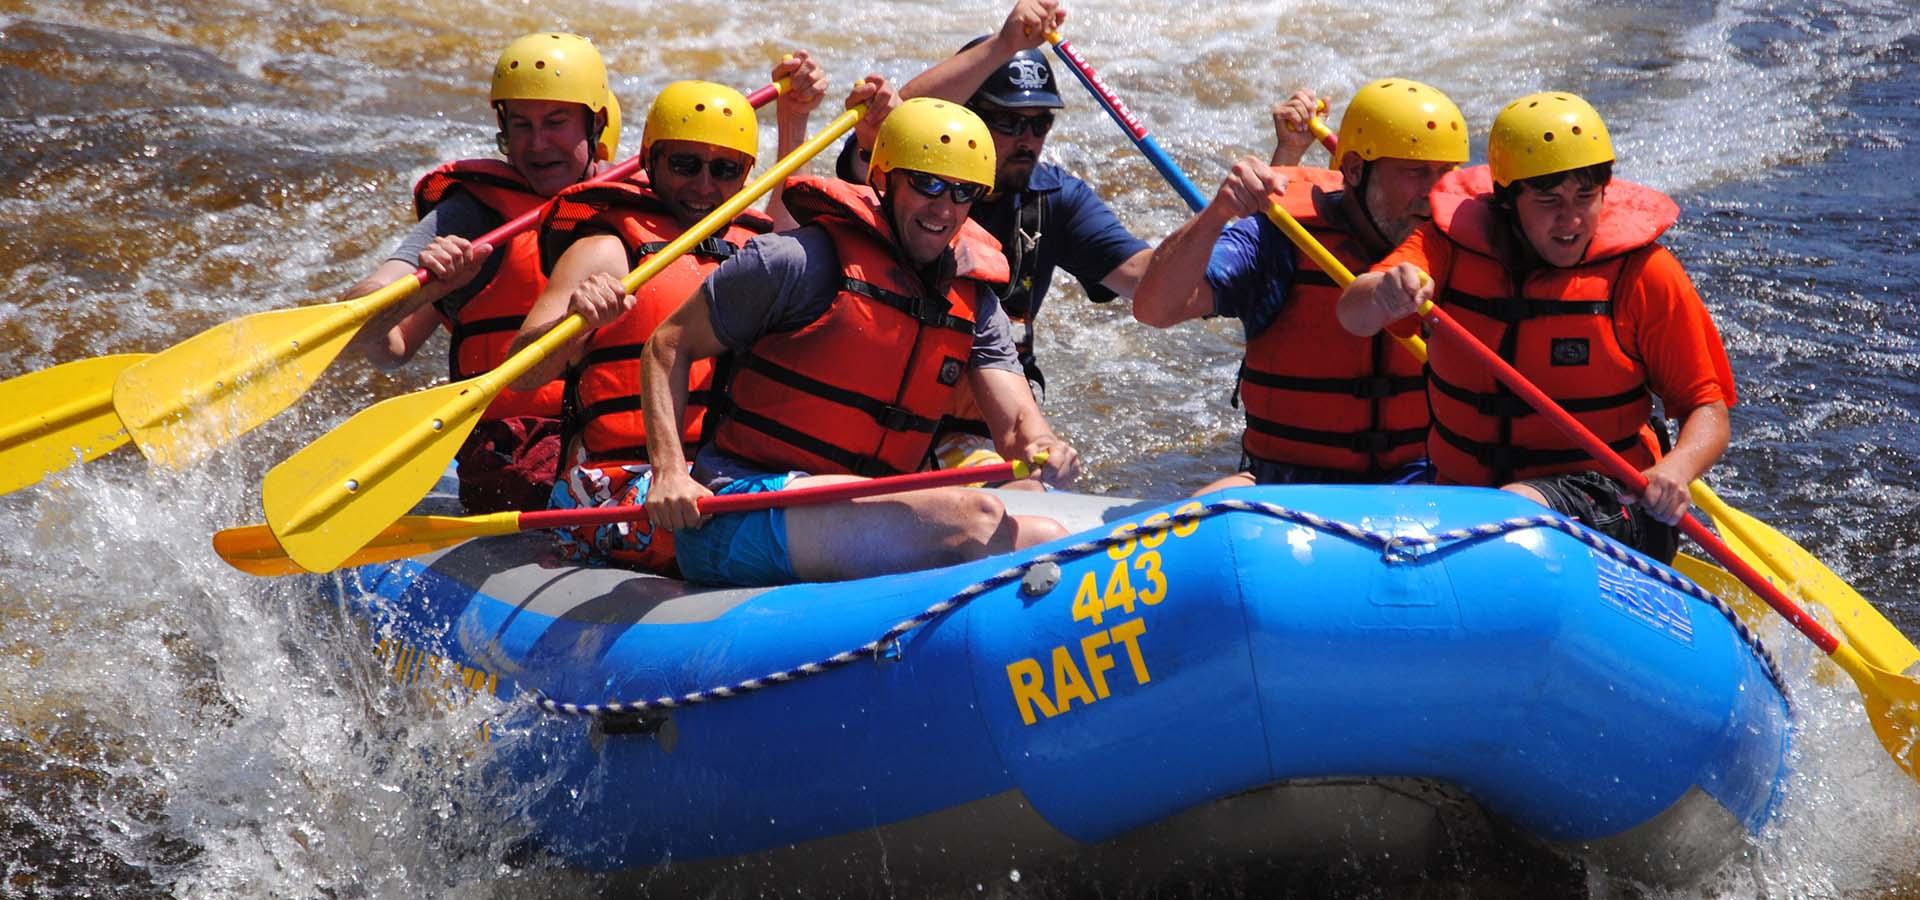 ATV Adventure ( Cloned ) - Bachelor Party Costa Rica